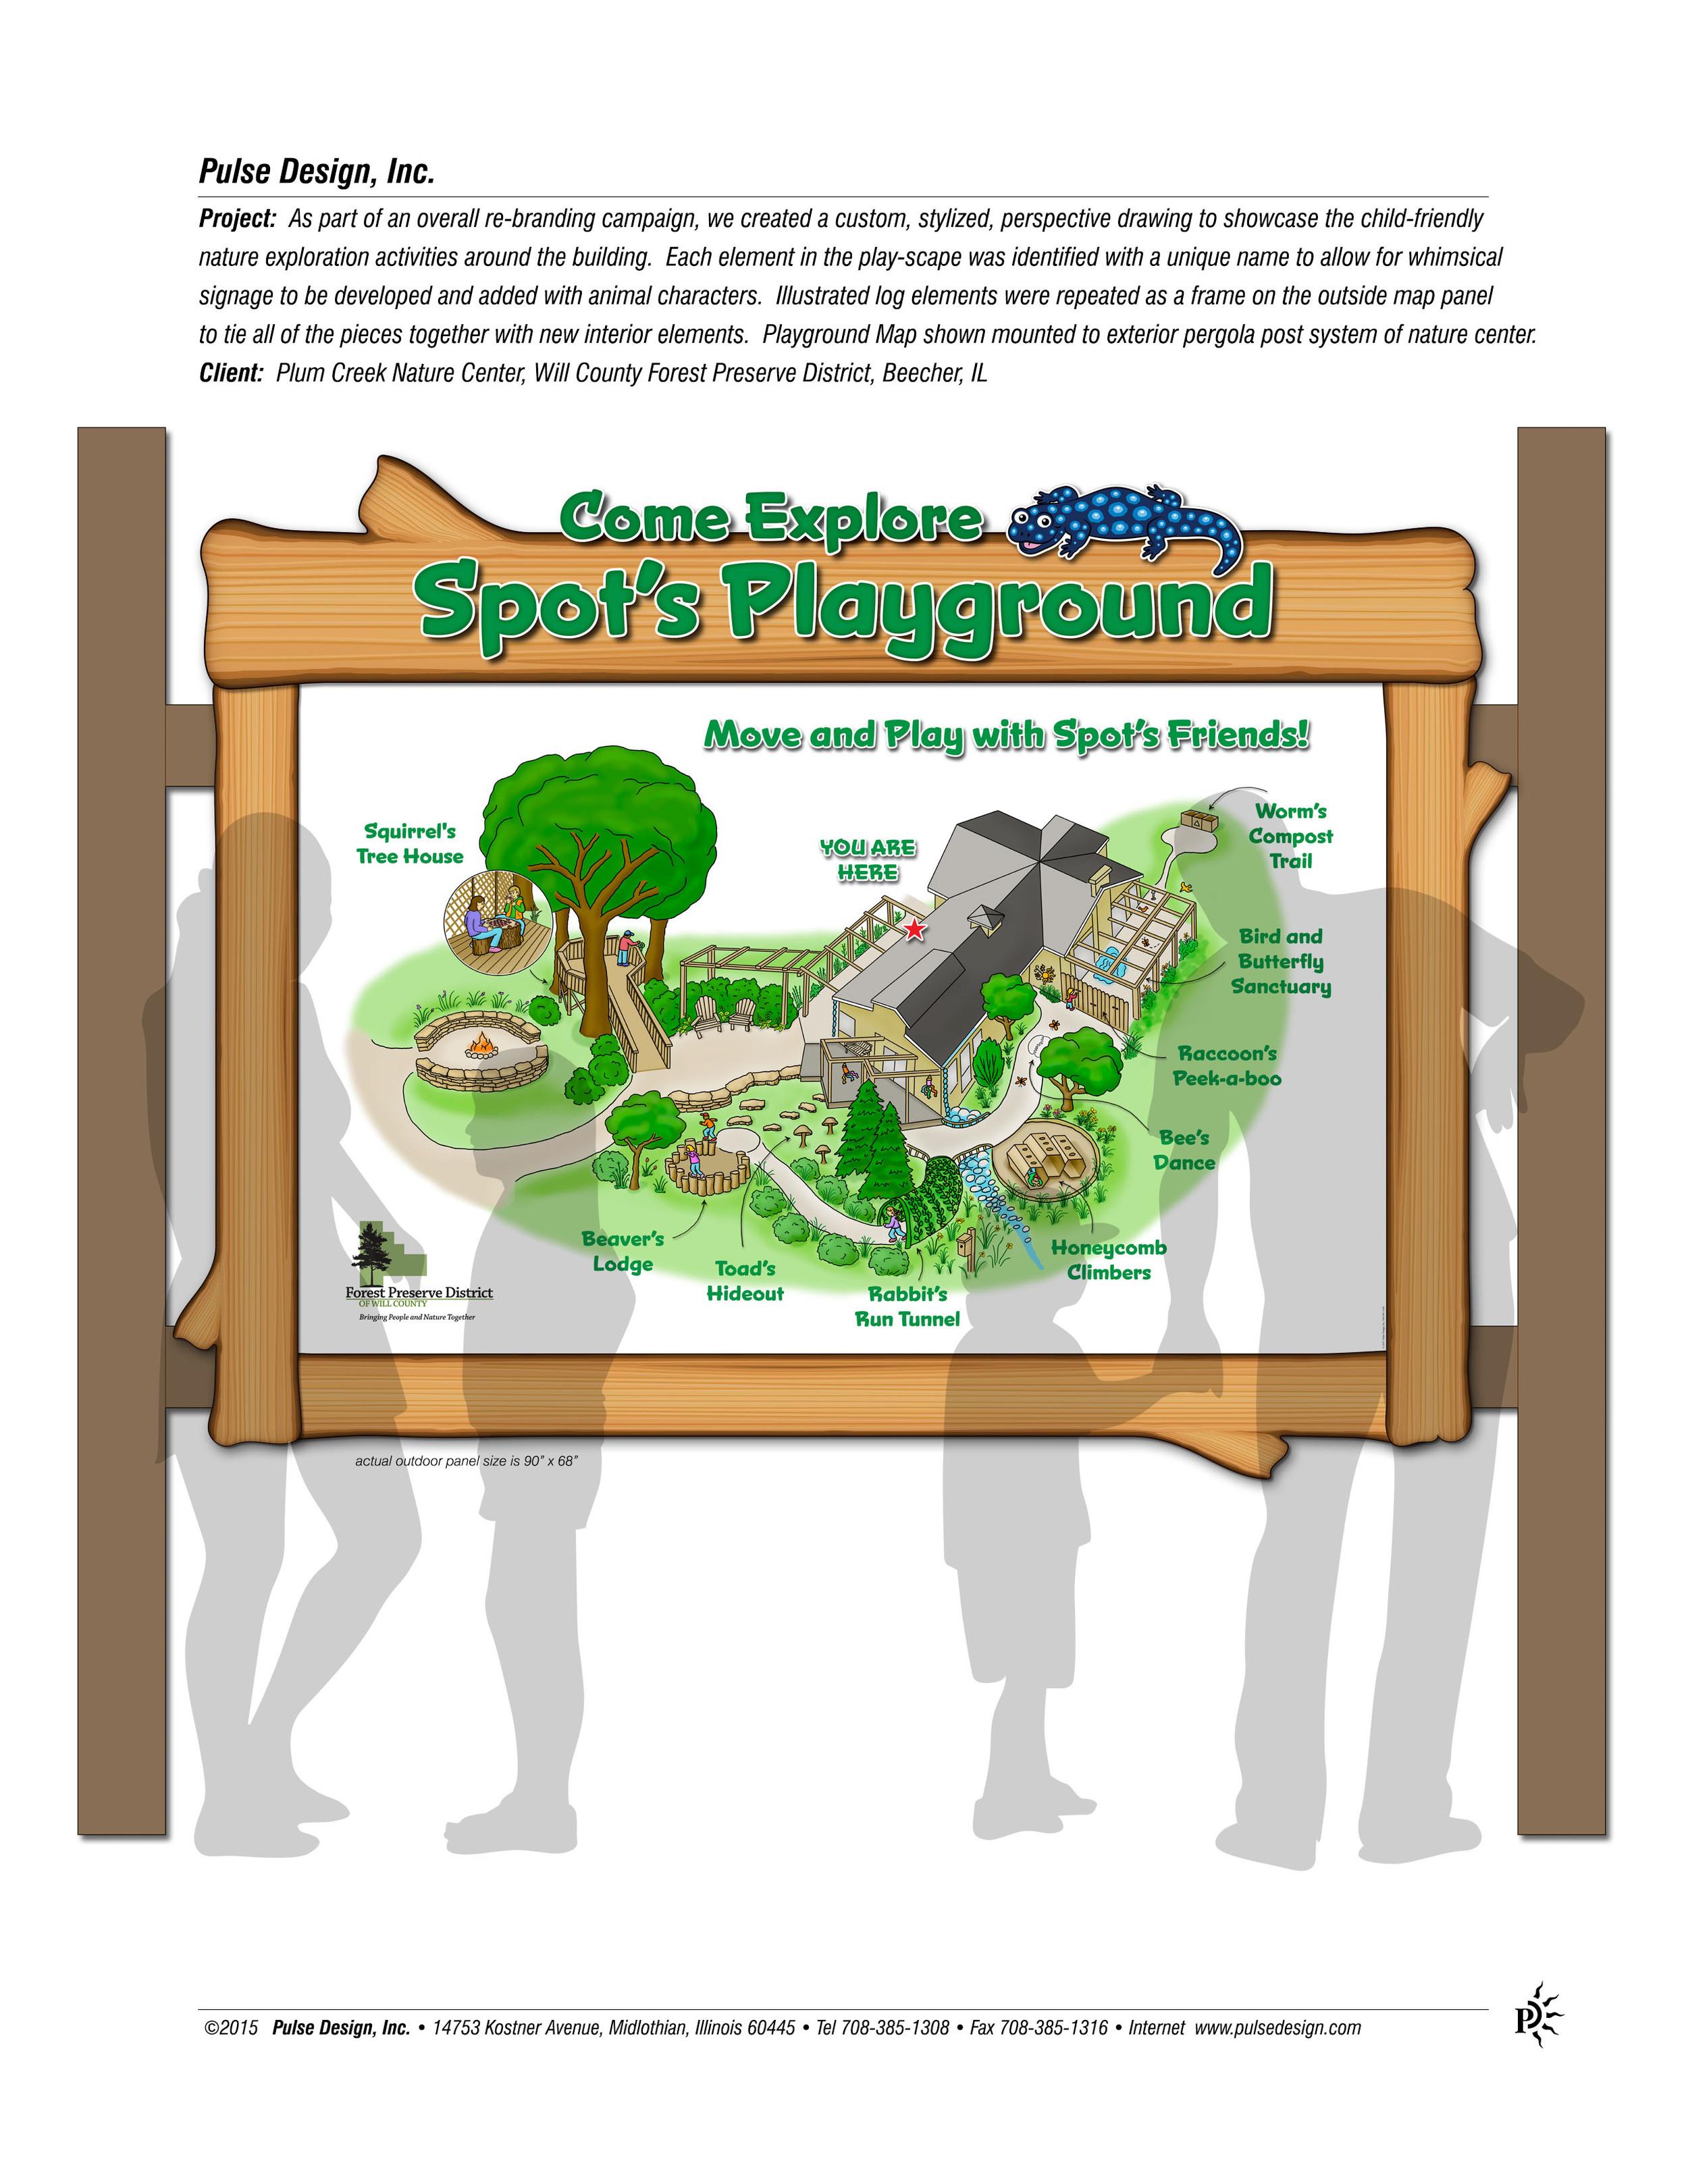 Plum-Creek-Spots-Playground-Map-Wall-Pulse-Design-Inc.jpg